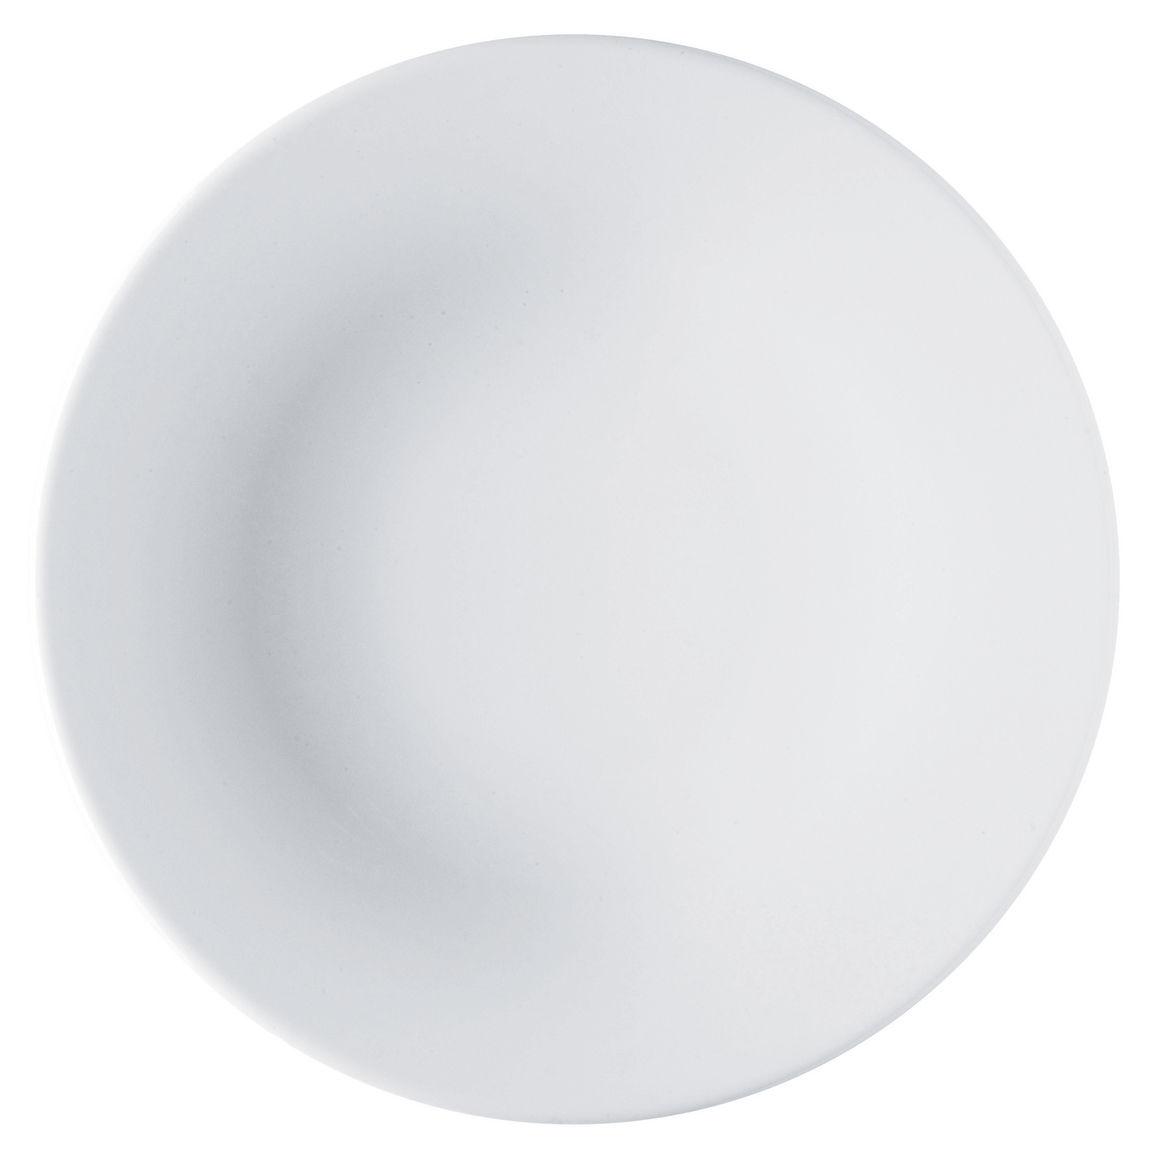 Tableware - Plates - Ku Plate by Alessi - White - China